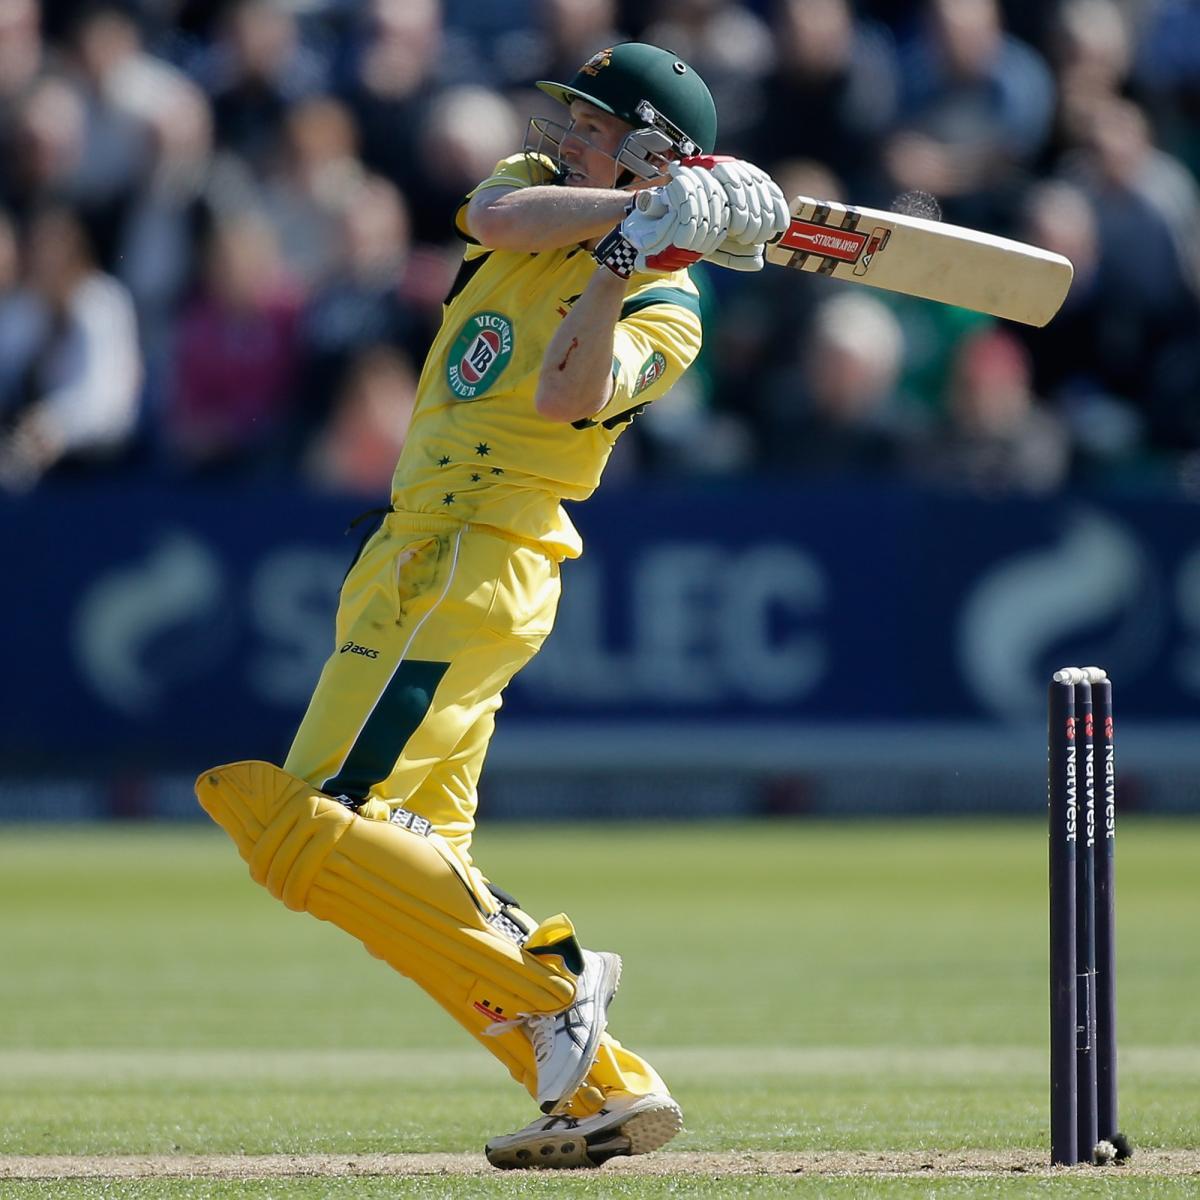 India Vs. Australia, 4th ODI: Date, Time, Live Stream, TV